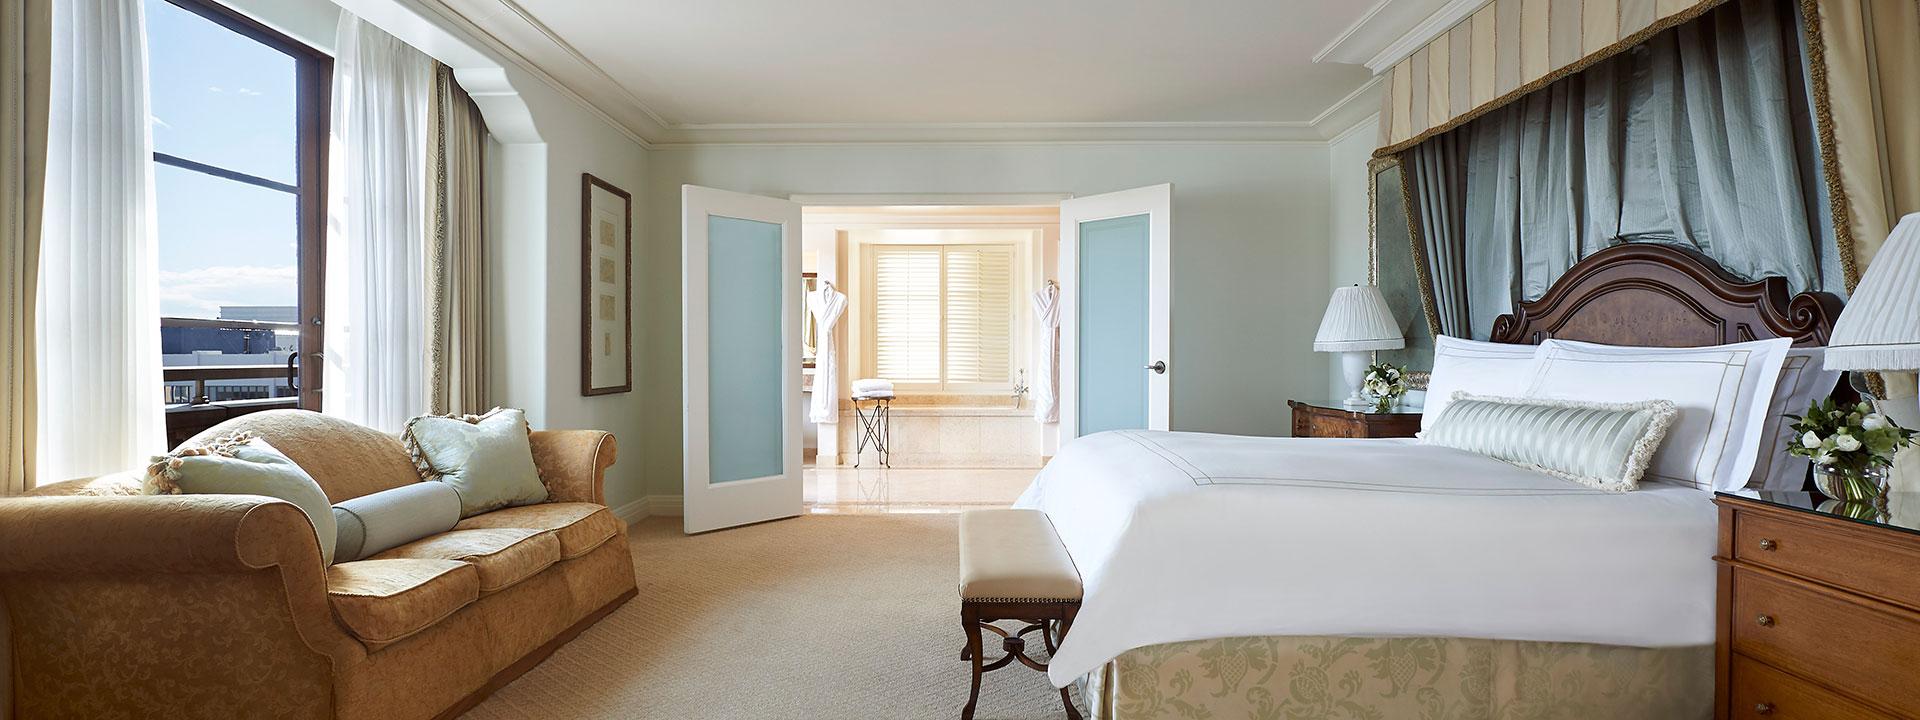 California Suite bedroom and bathroom view